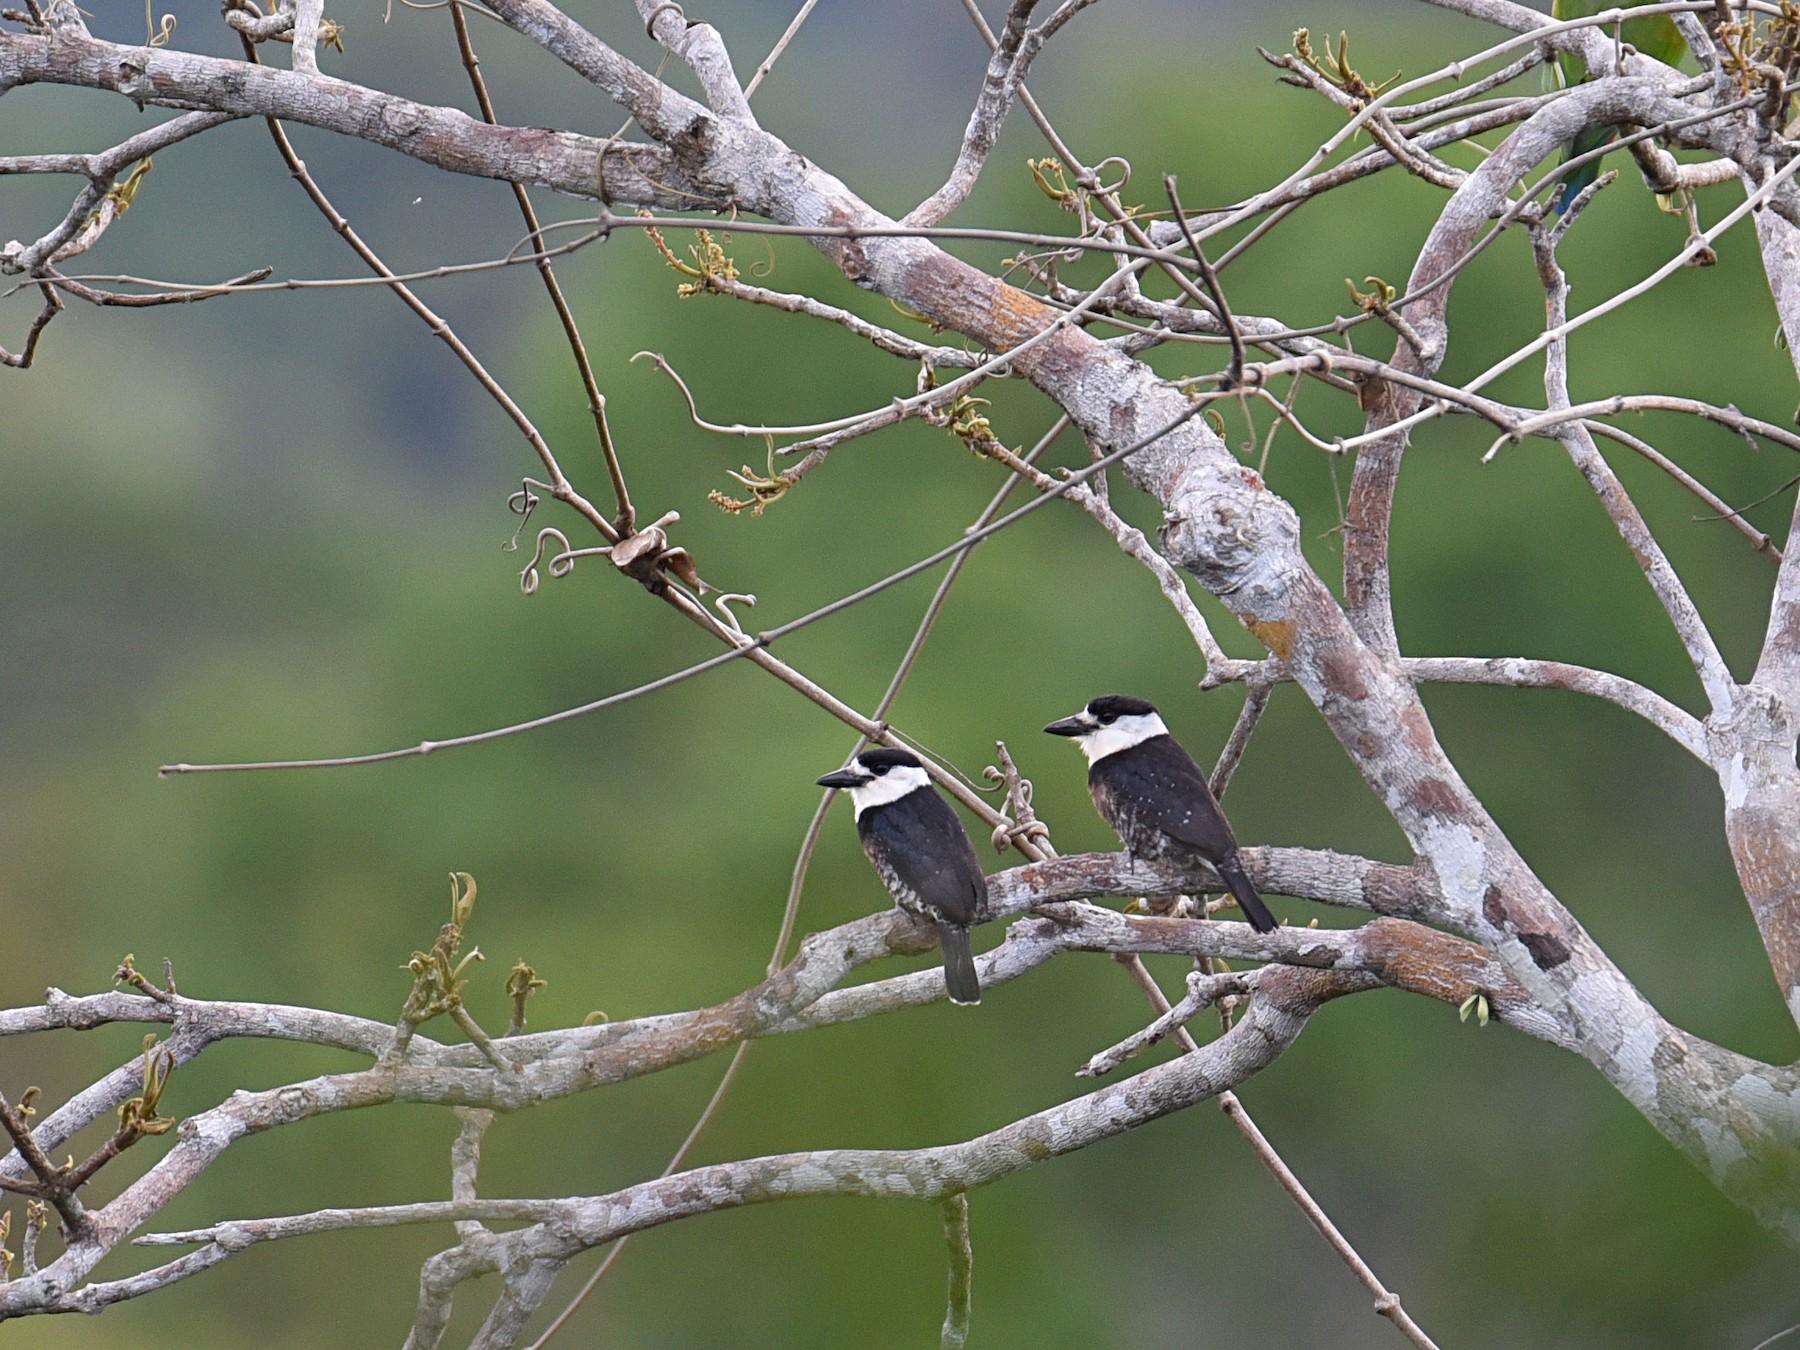 Brown-banded Puffbird - Shailesh Pinto